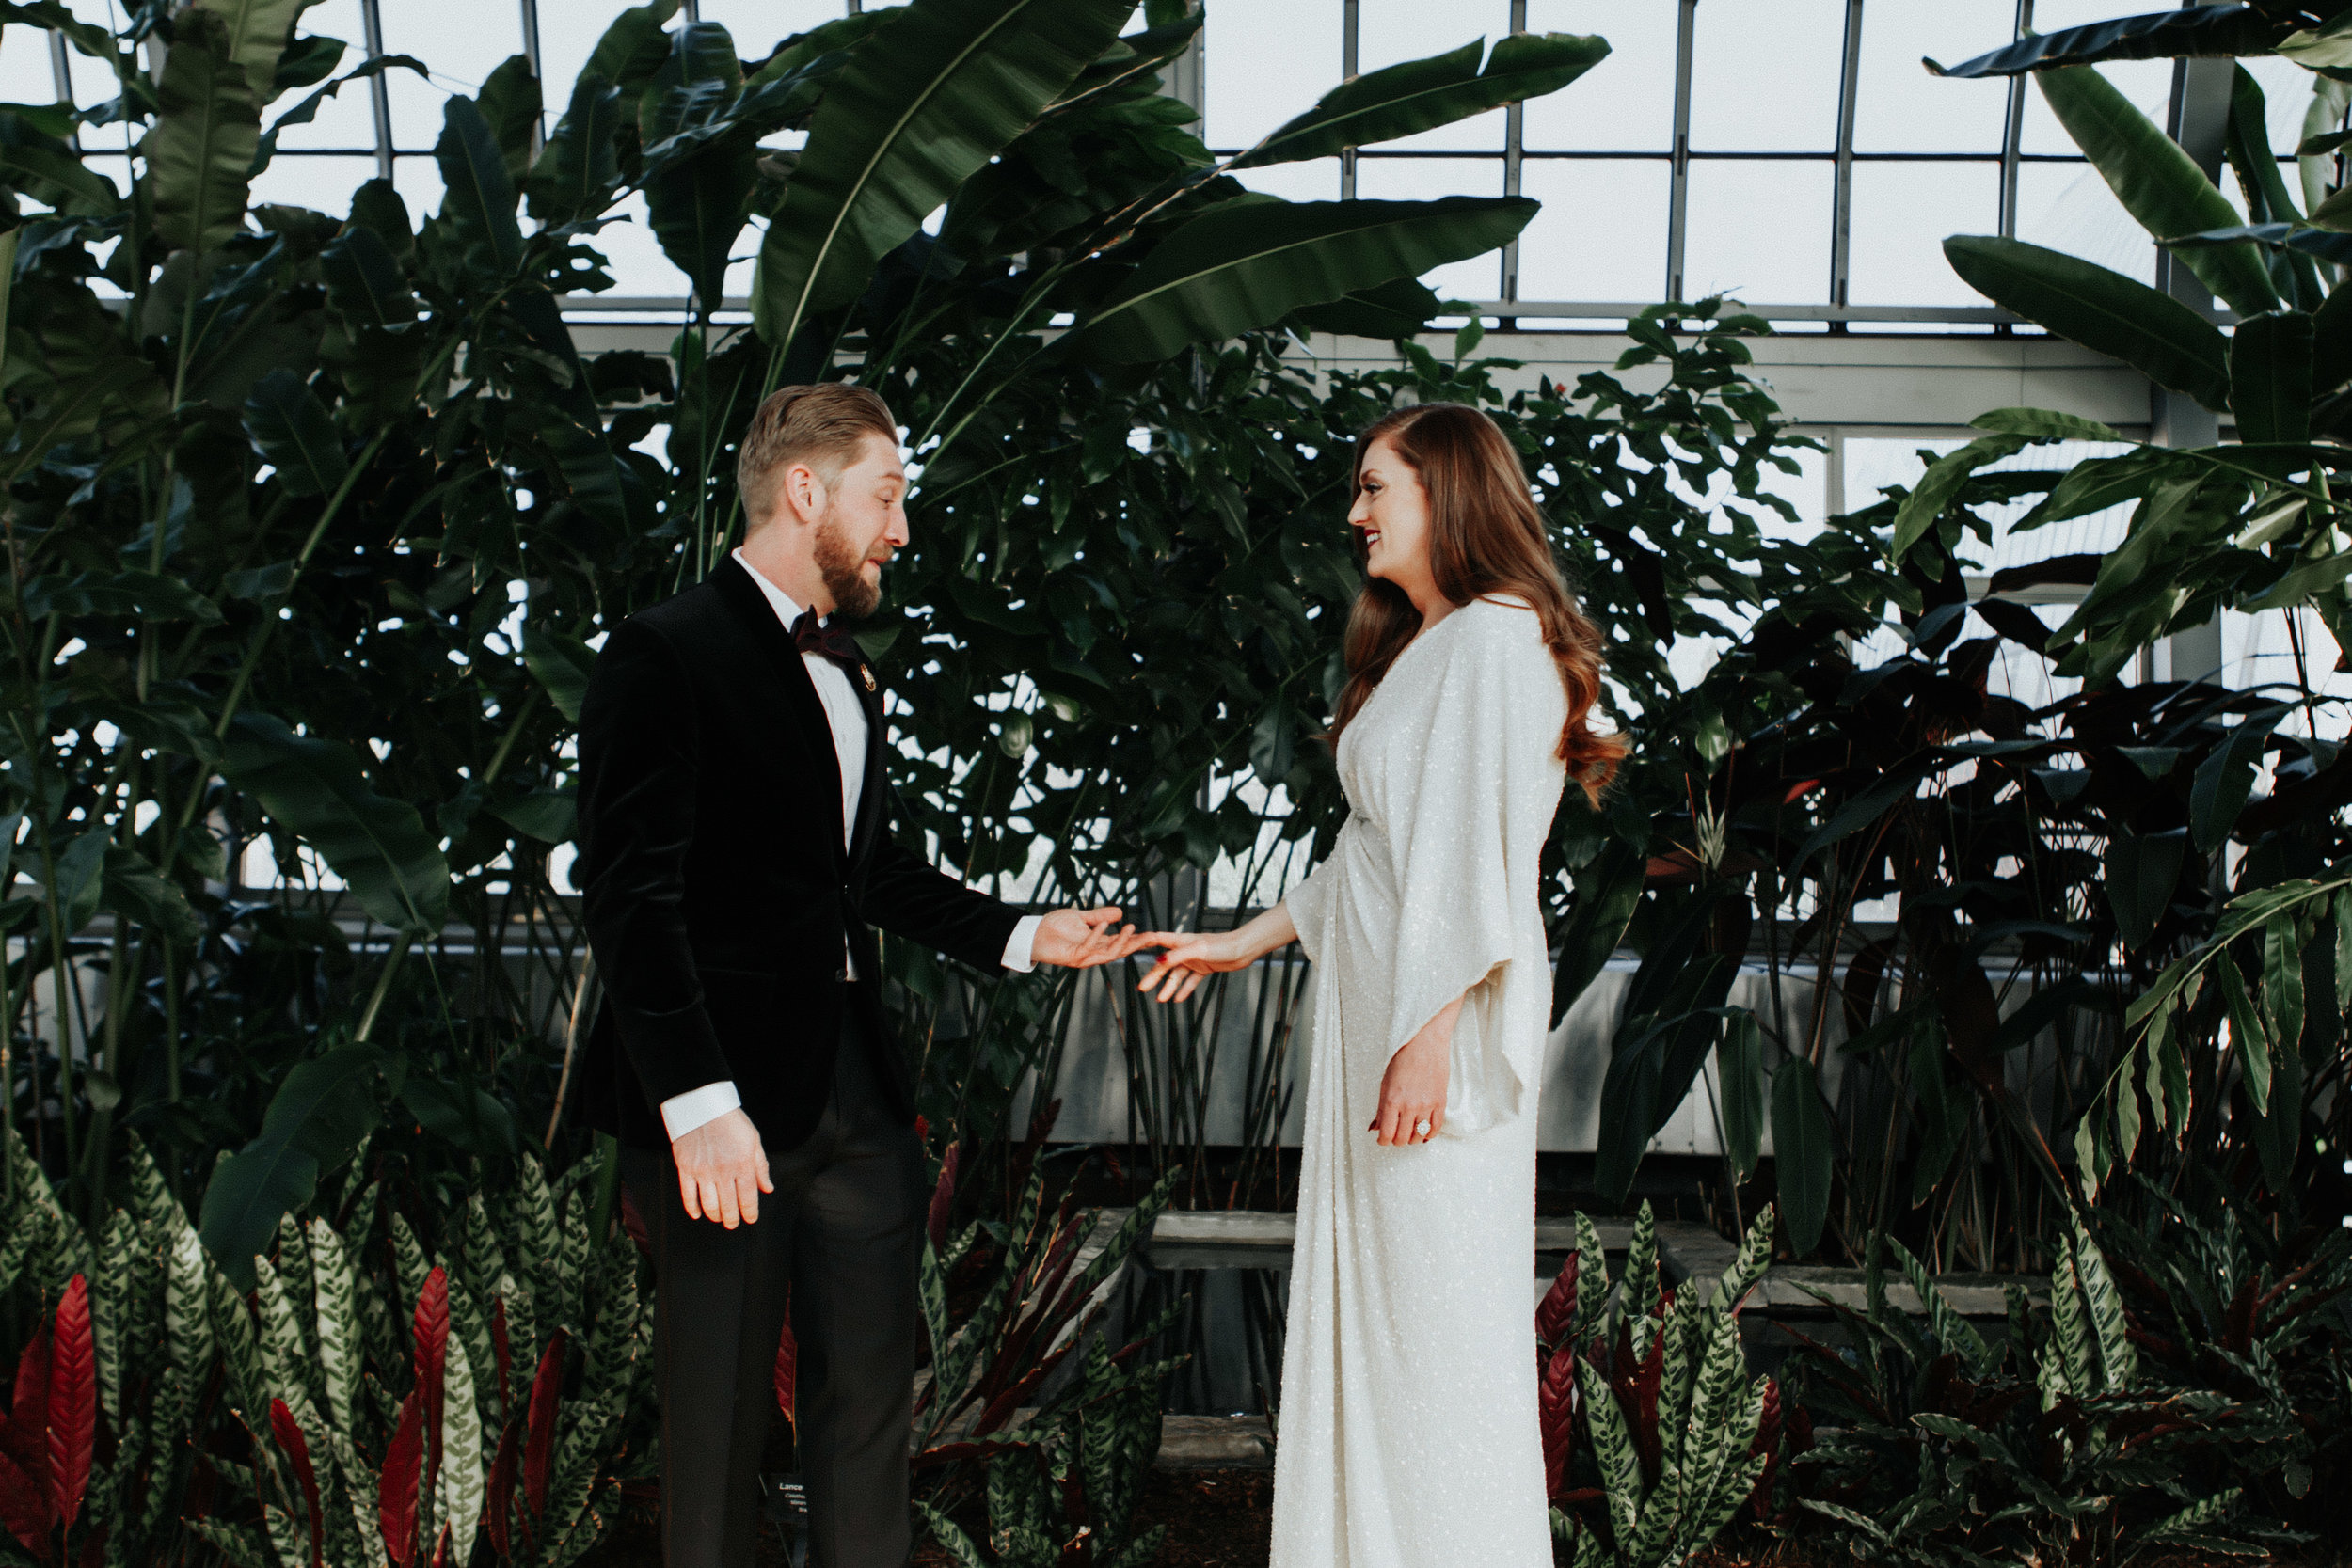 Garfield Park Conservatory intimate wedding photographer